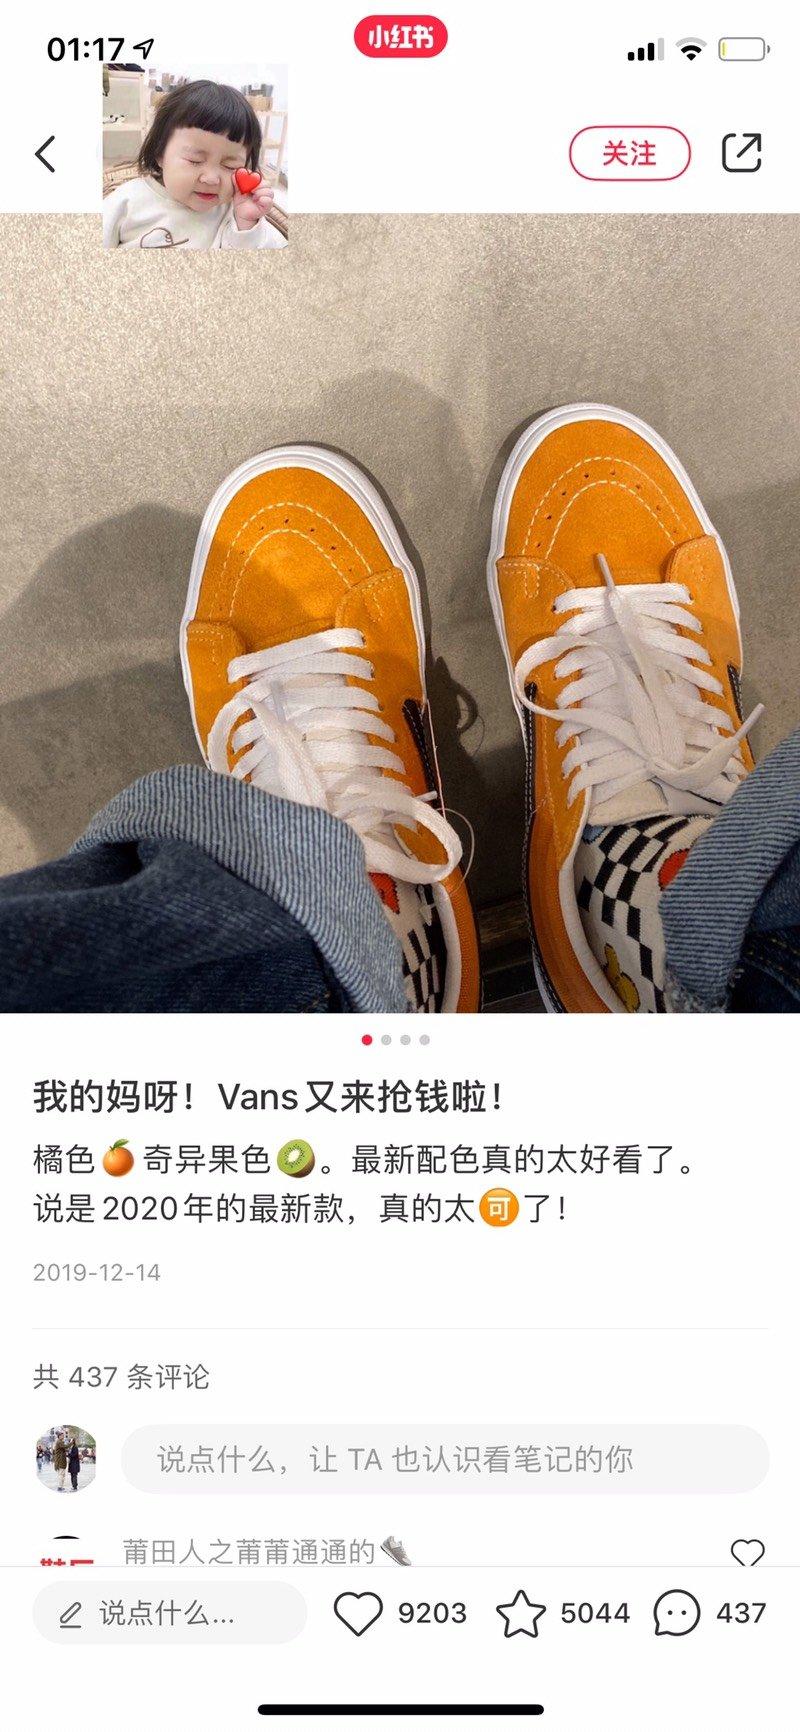 VANS 2120新年配色 奇异果🥝 橘色🍊